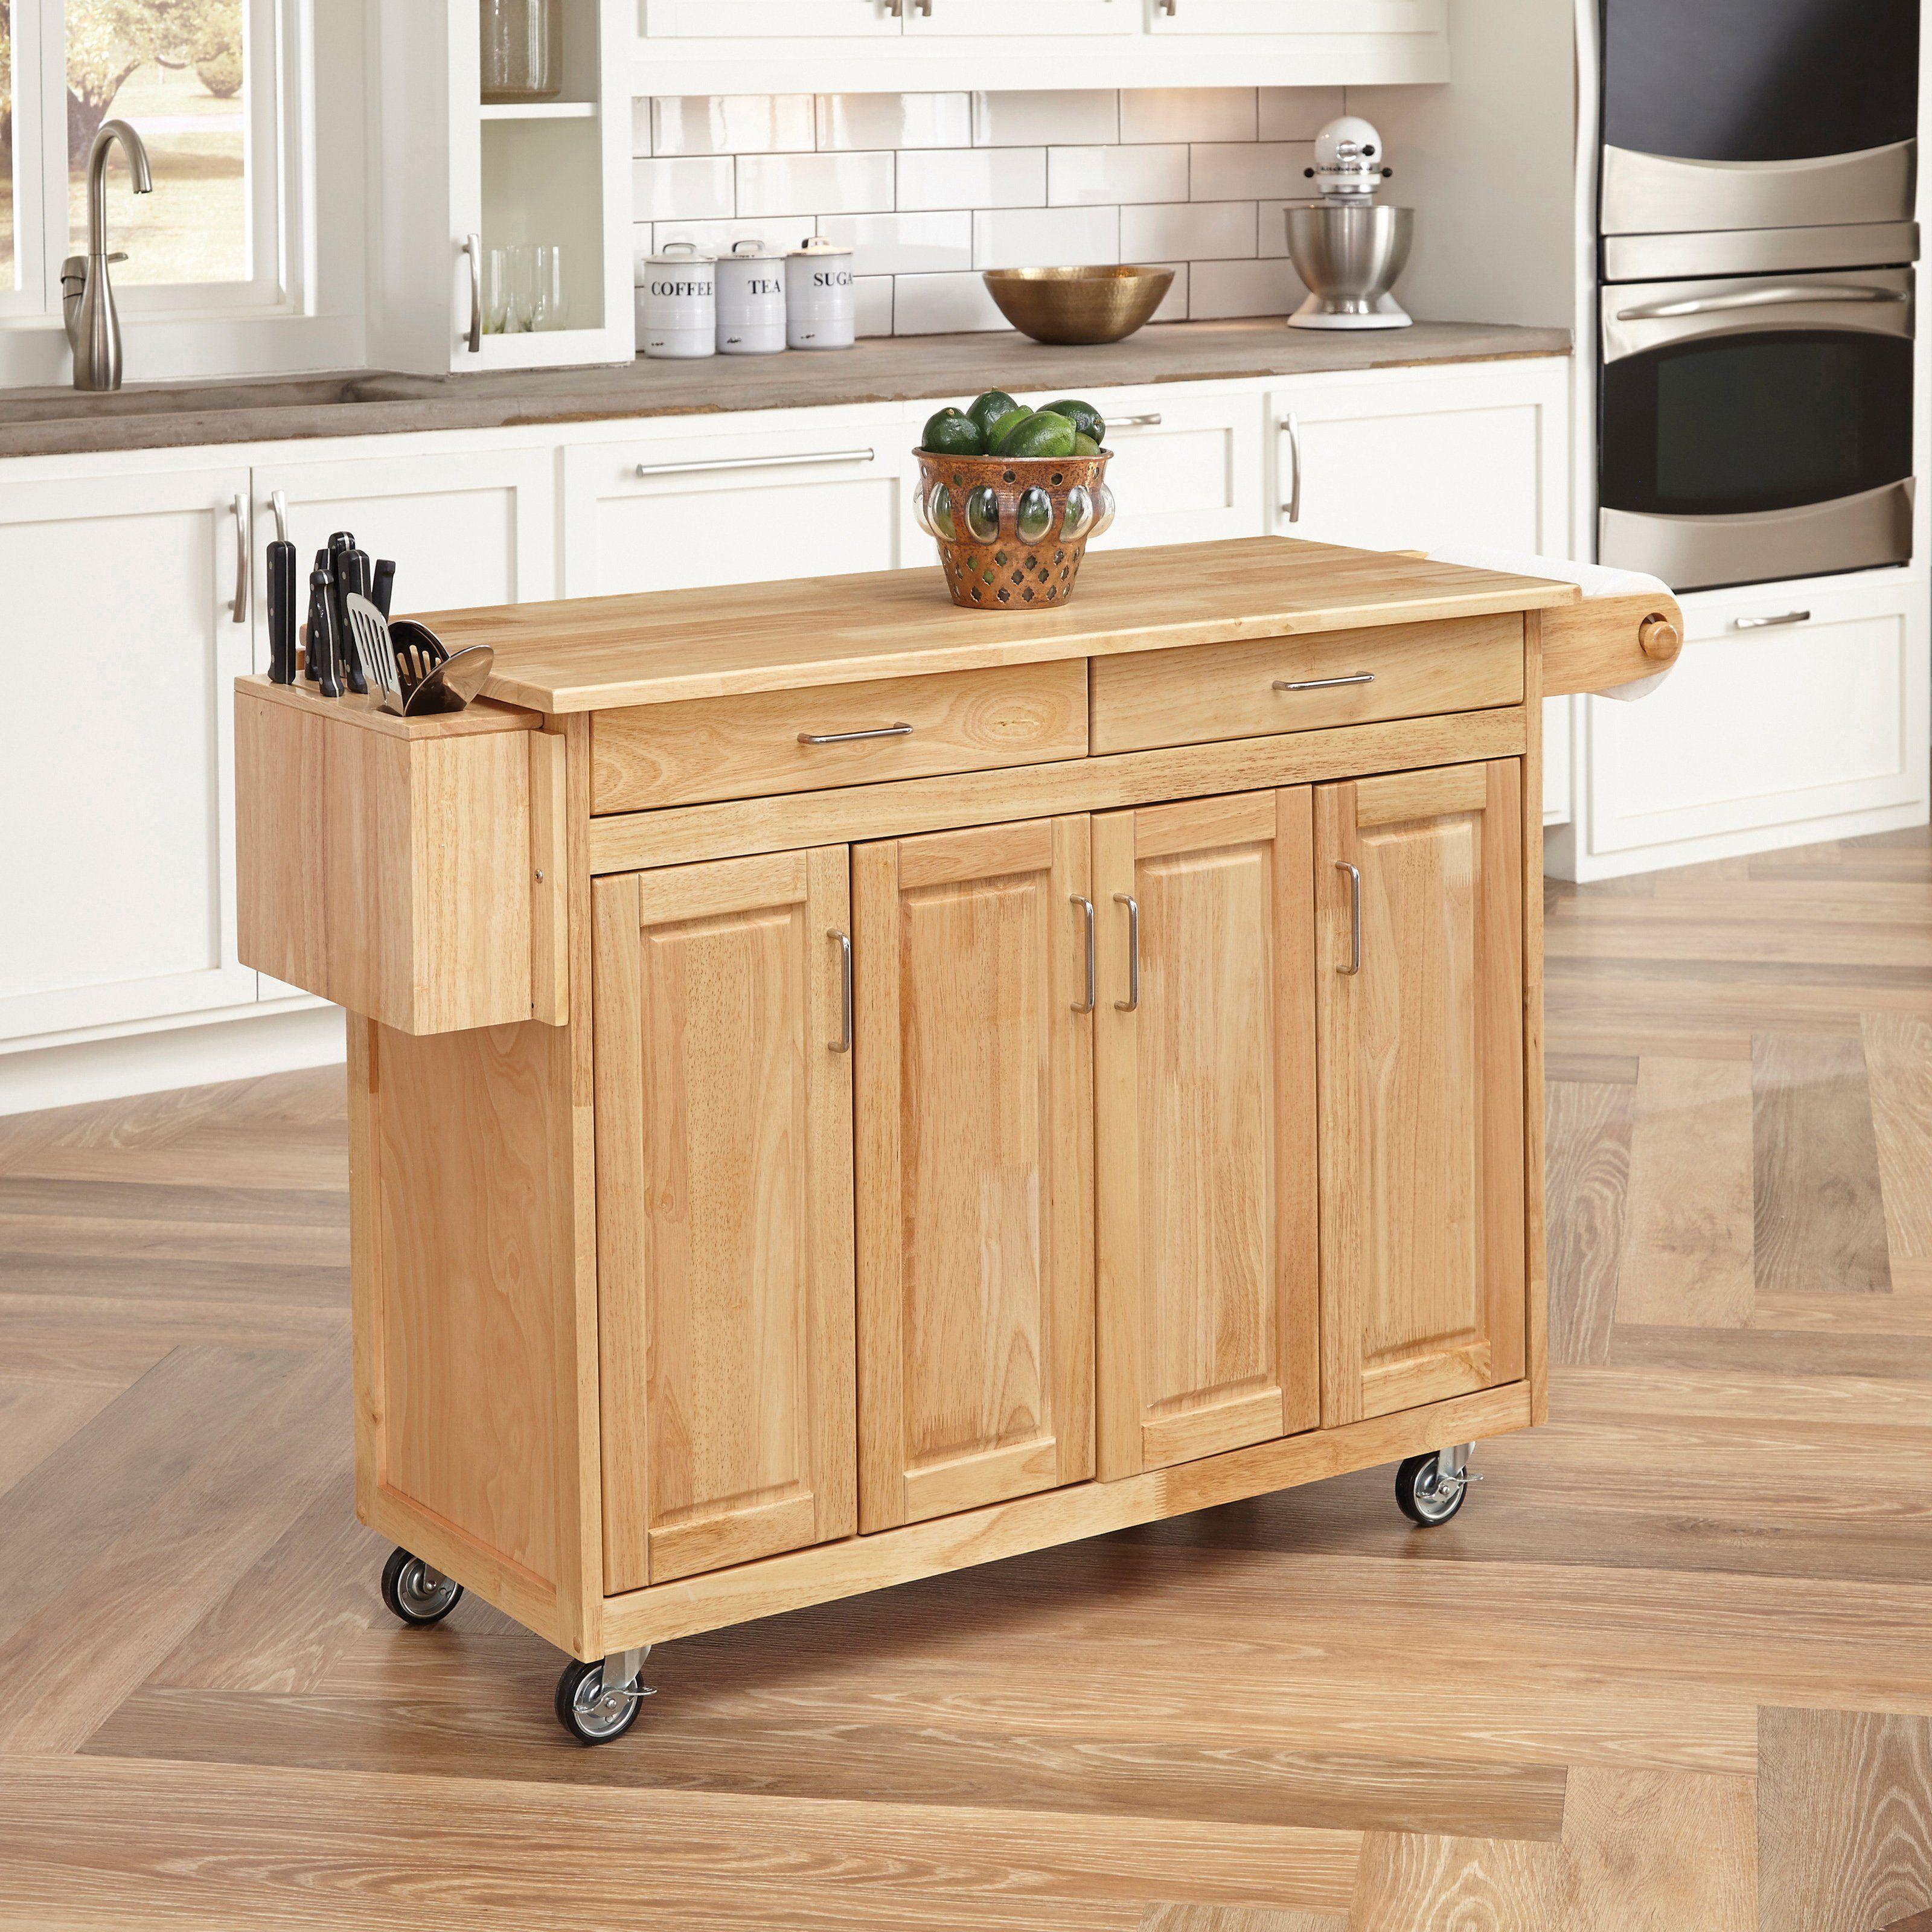 Home Styles Benton Kitchen Cart | from hayneedle.com | Accessories ...